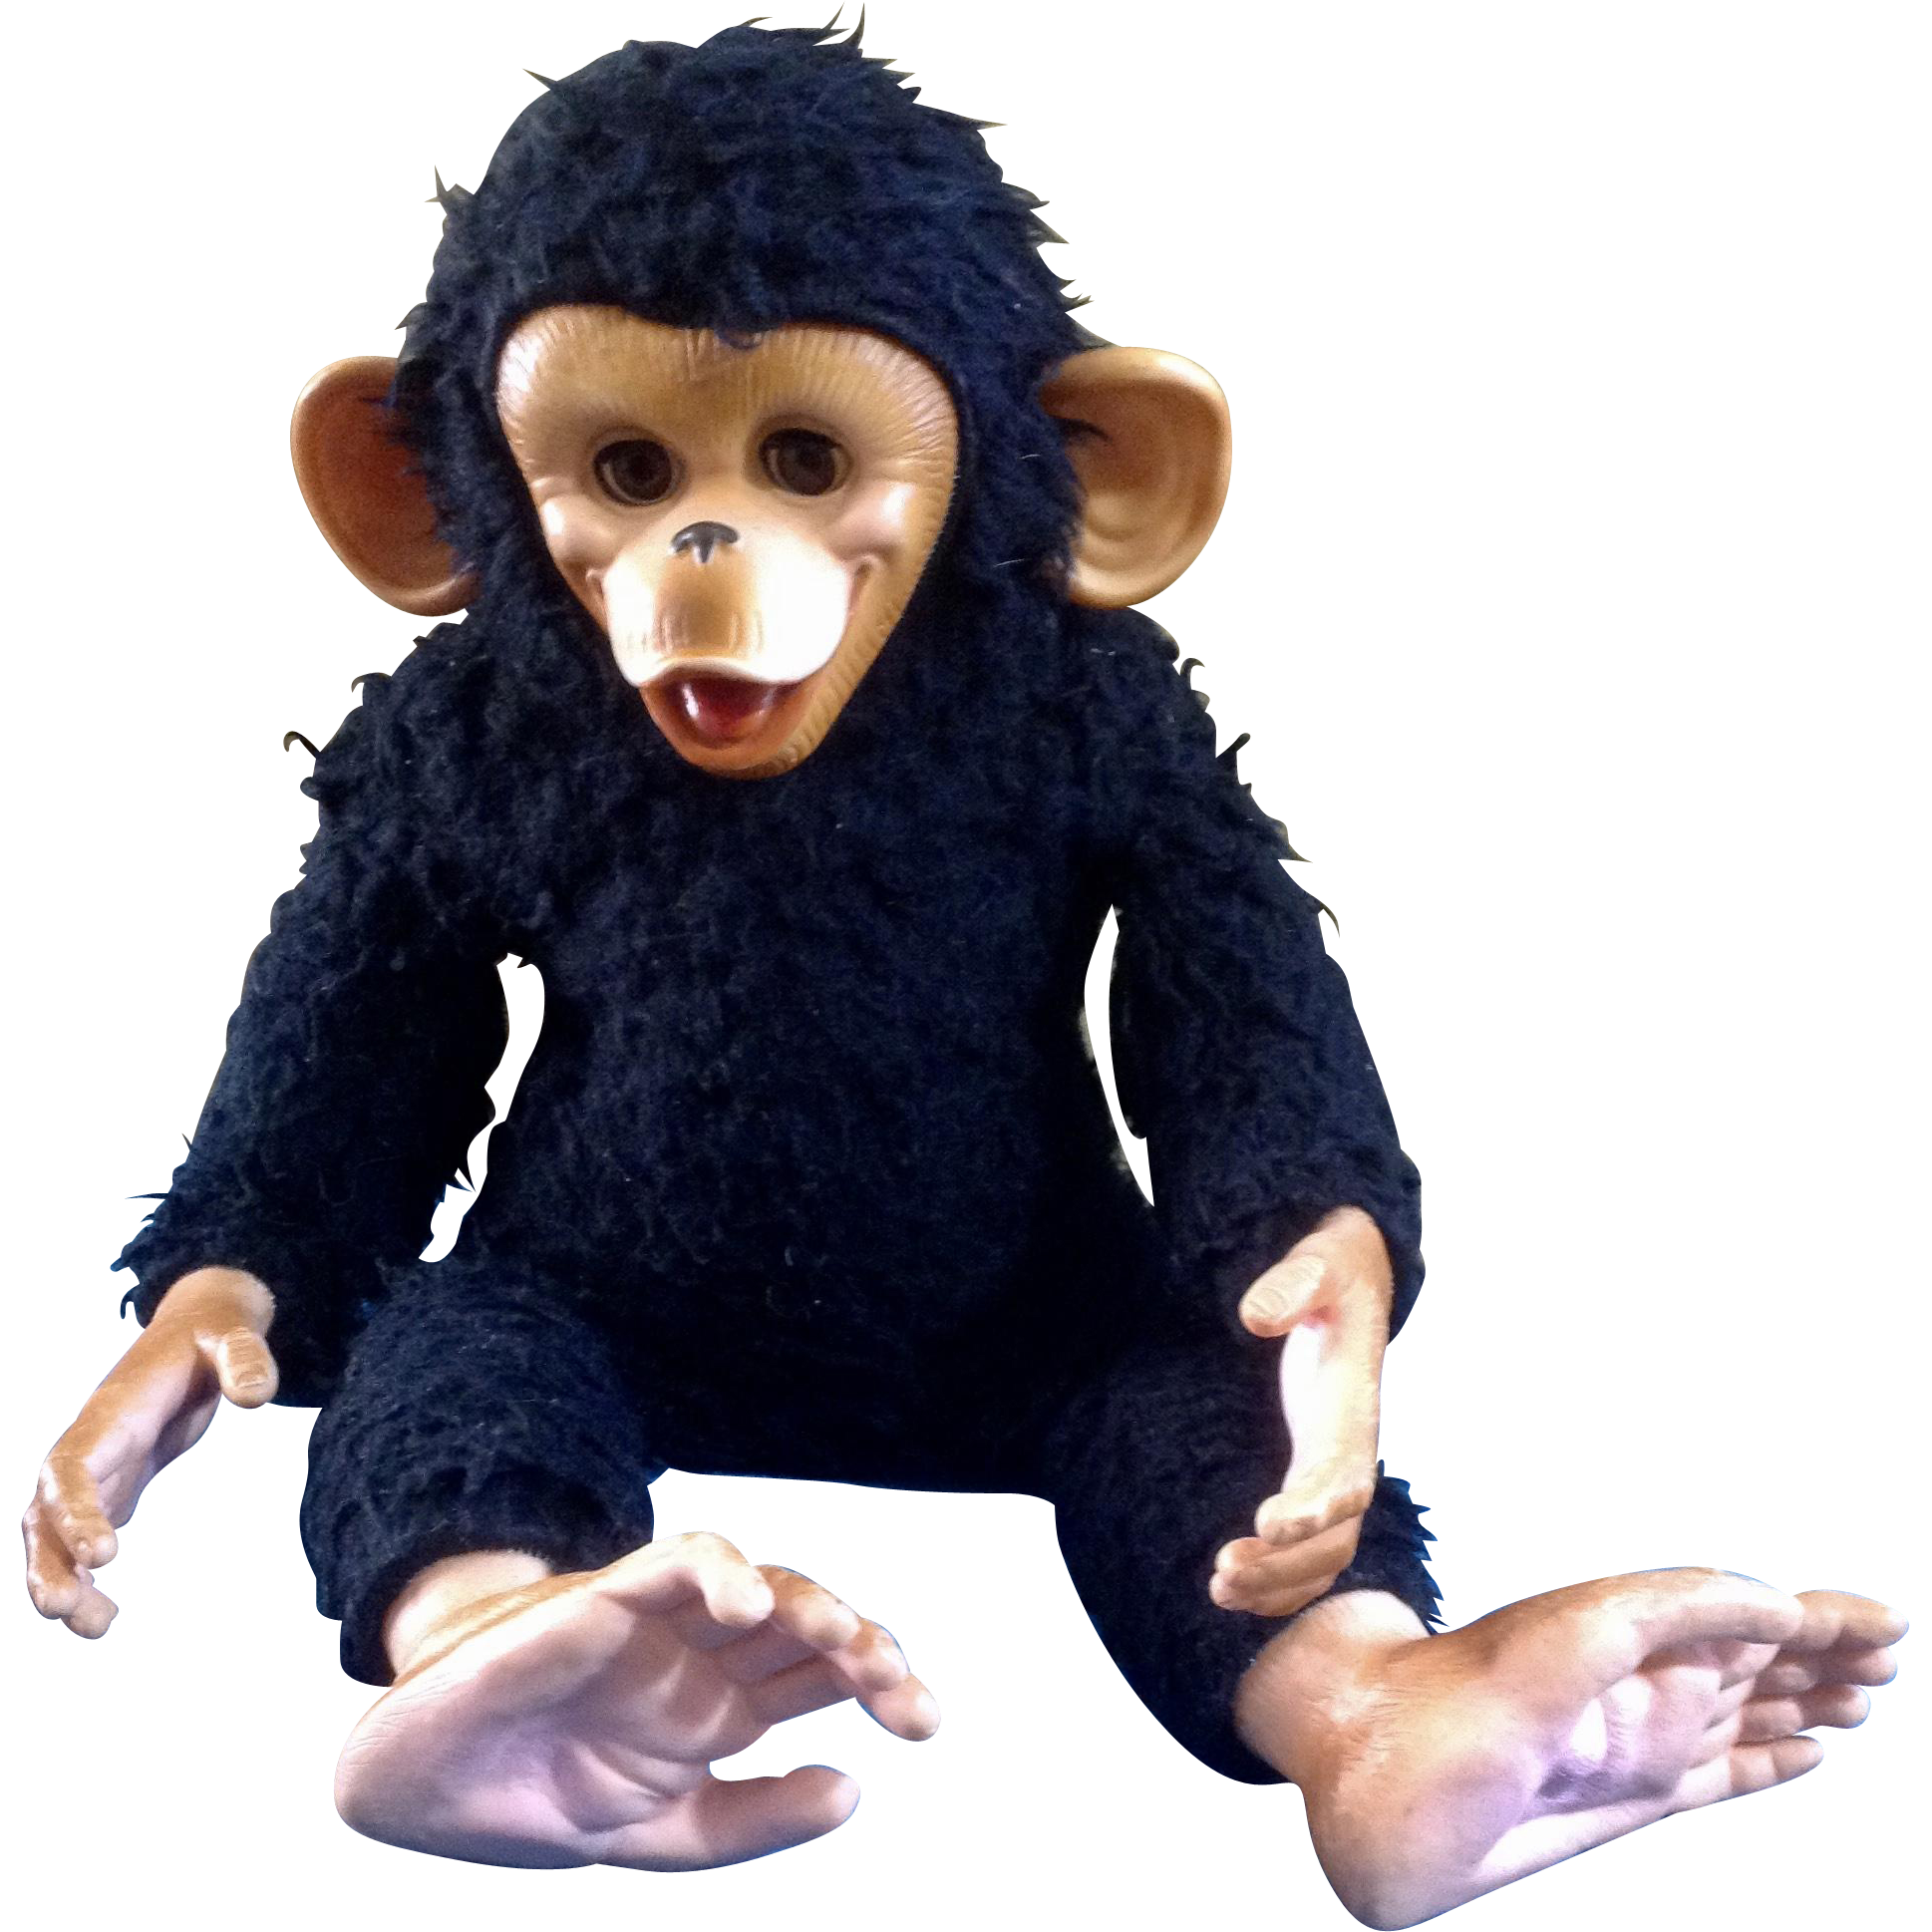 Vintage Gund Rubber Face Monkey Sleeping Eyes Life Like Black Chimp Stuffed Animal Plush Rubber Face Chimp Gund [ 1938 x 1938 Pixel ]